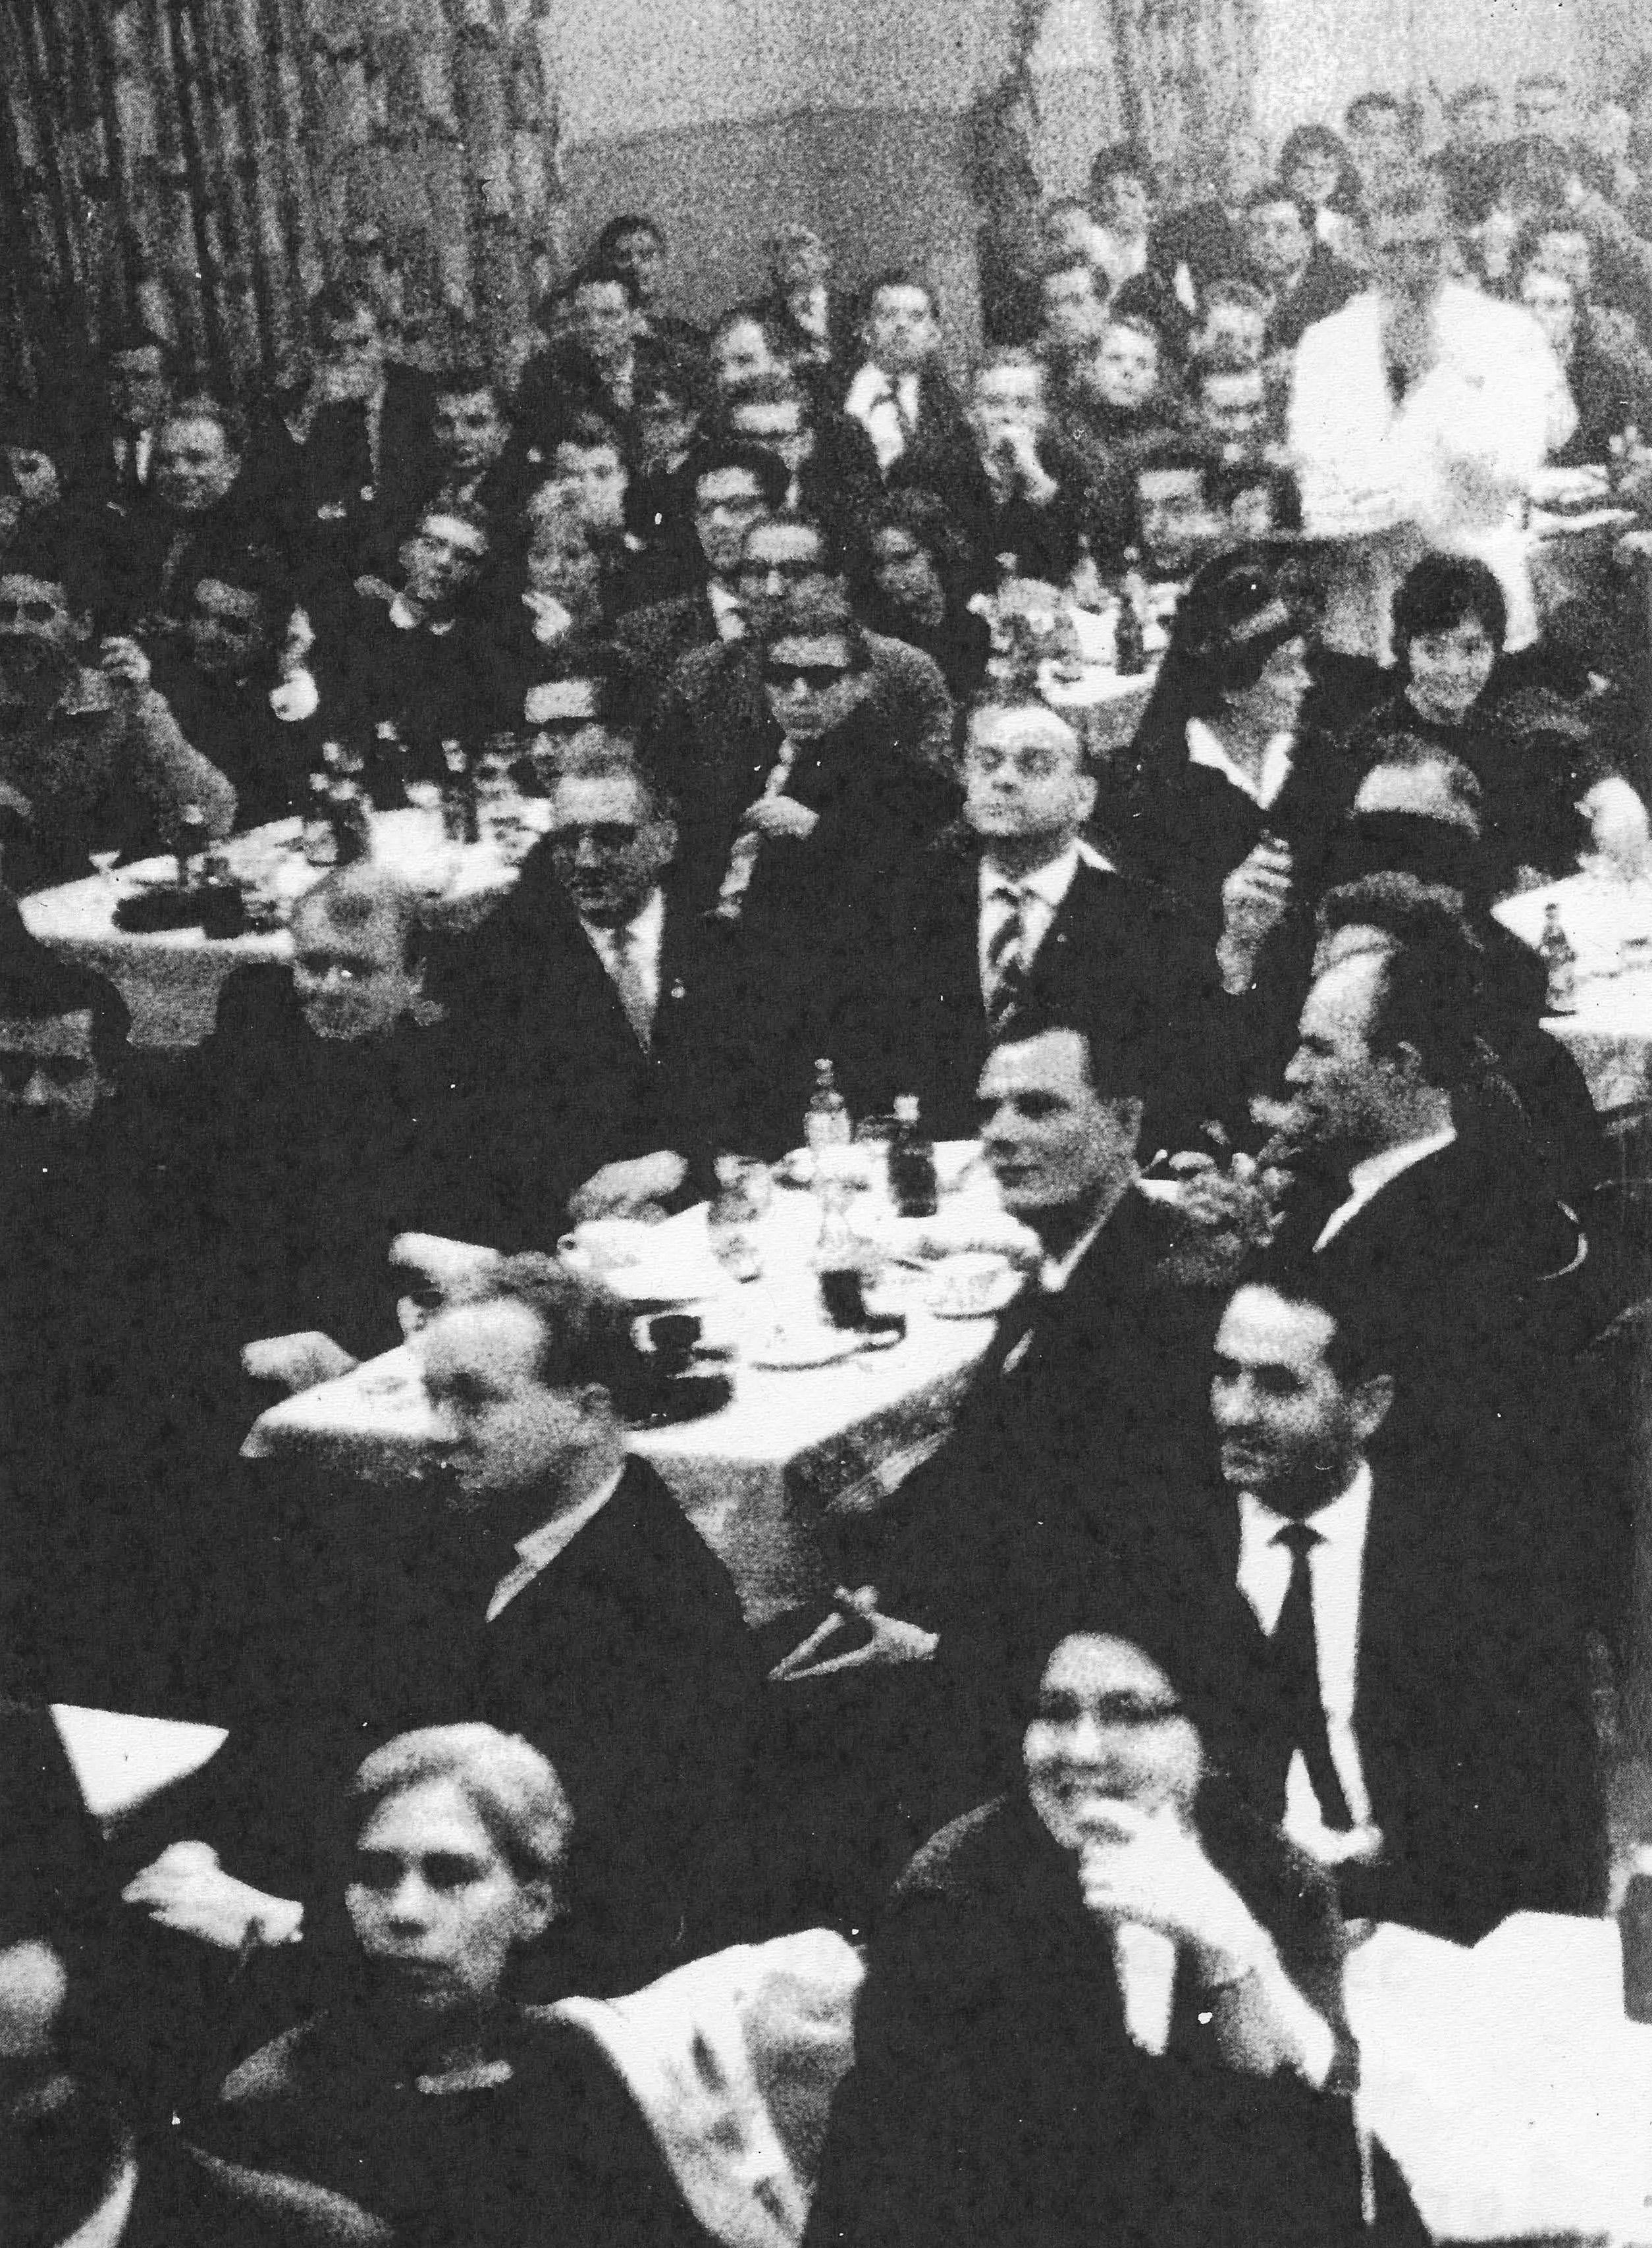 Spiegel aff re 1962 protest in l neburg for Spiegel history